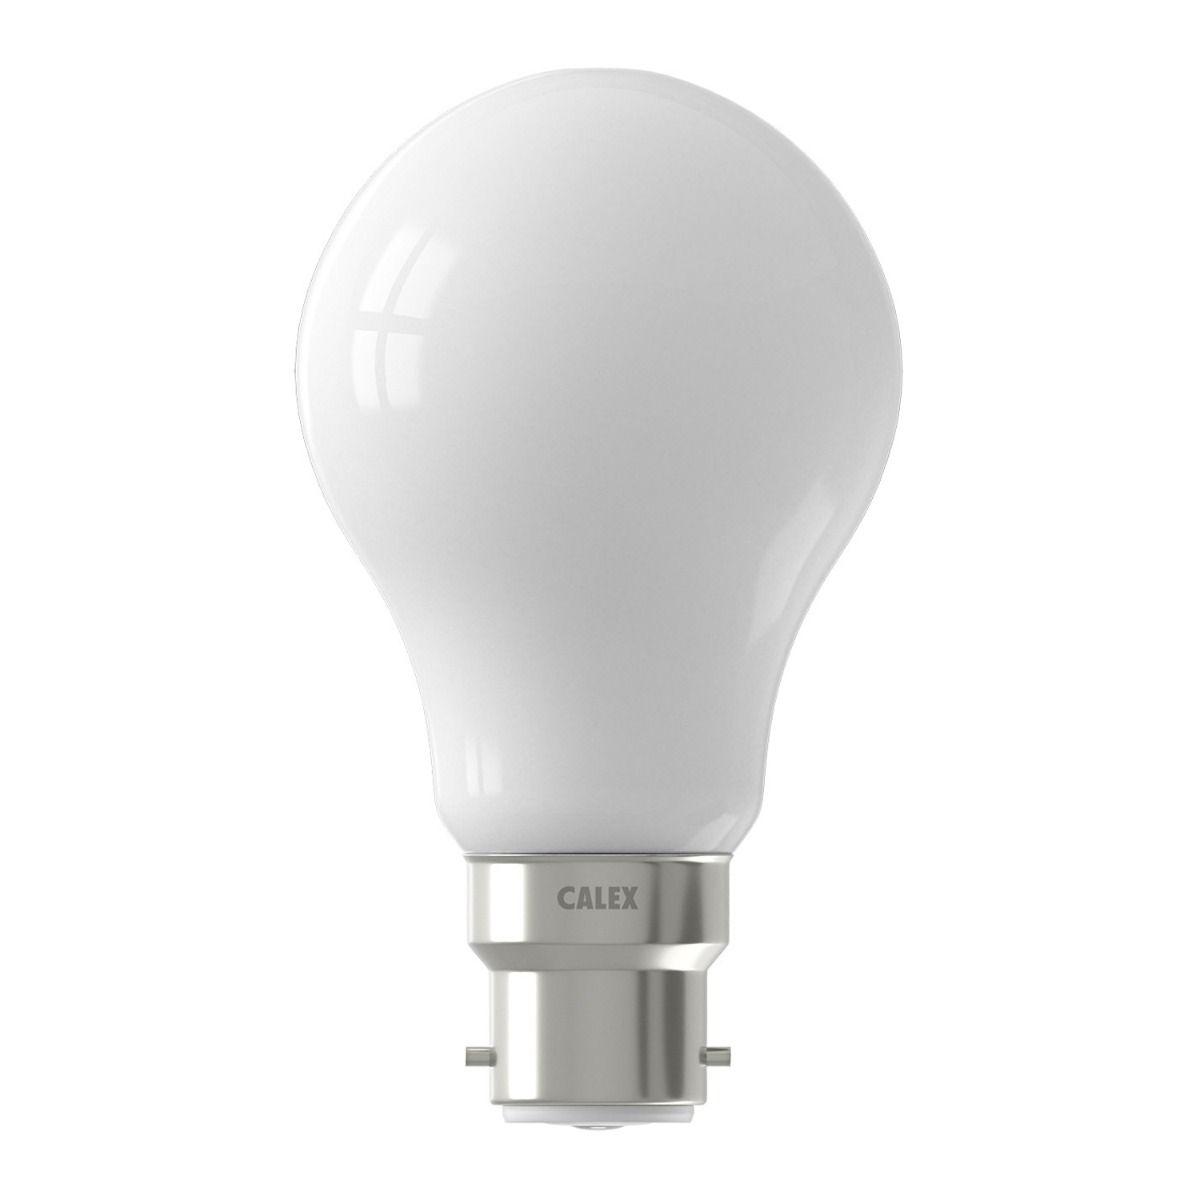 Calex Smart Standard LED Glühbirne B22 7W 806lm 2200-4000K | Tuya Wifi